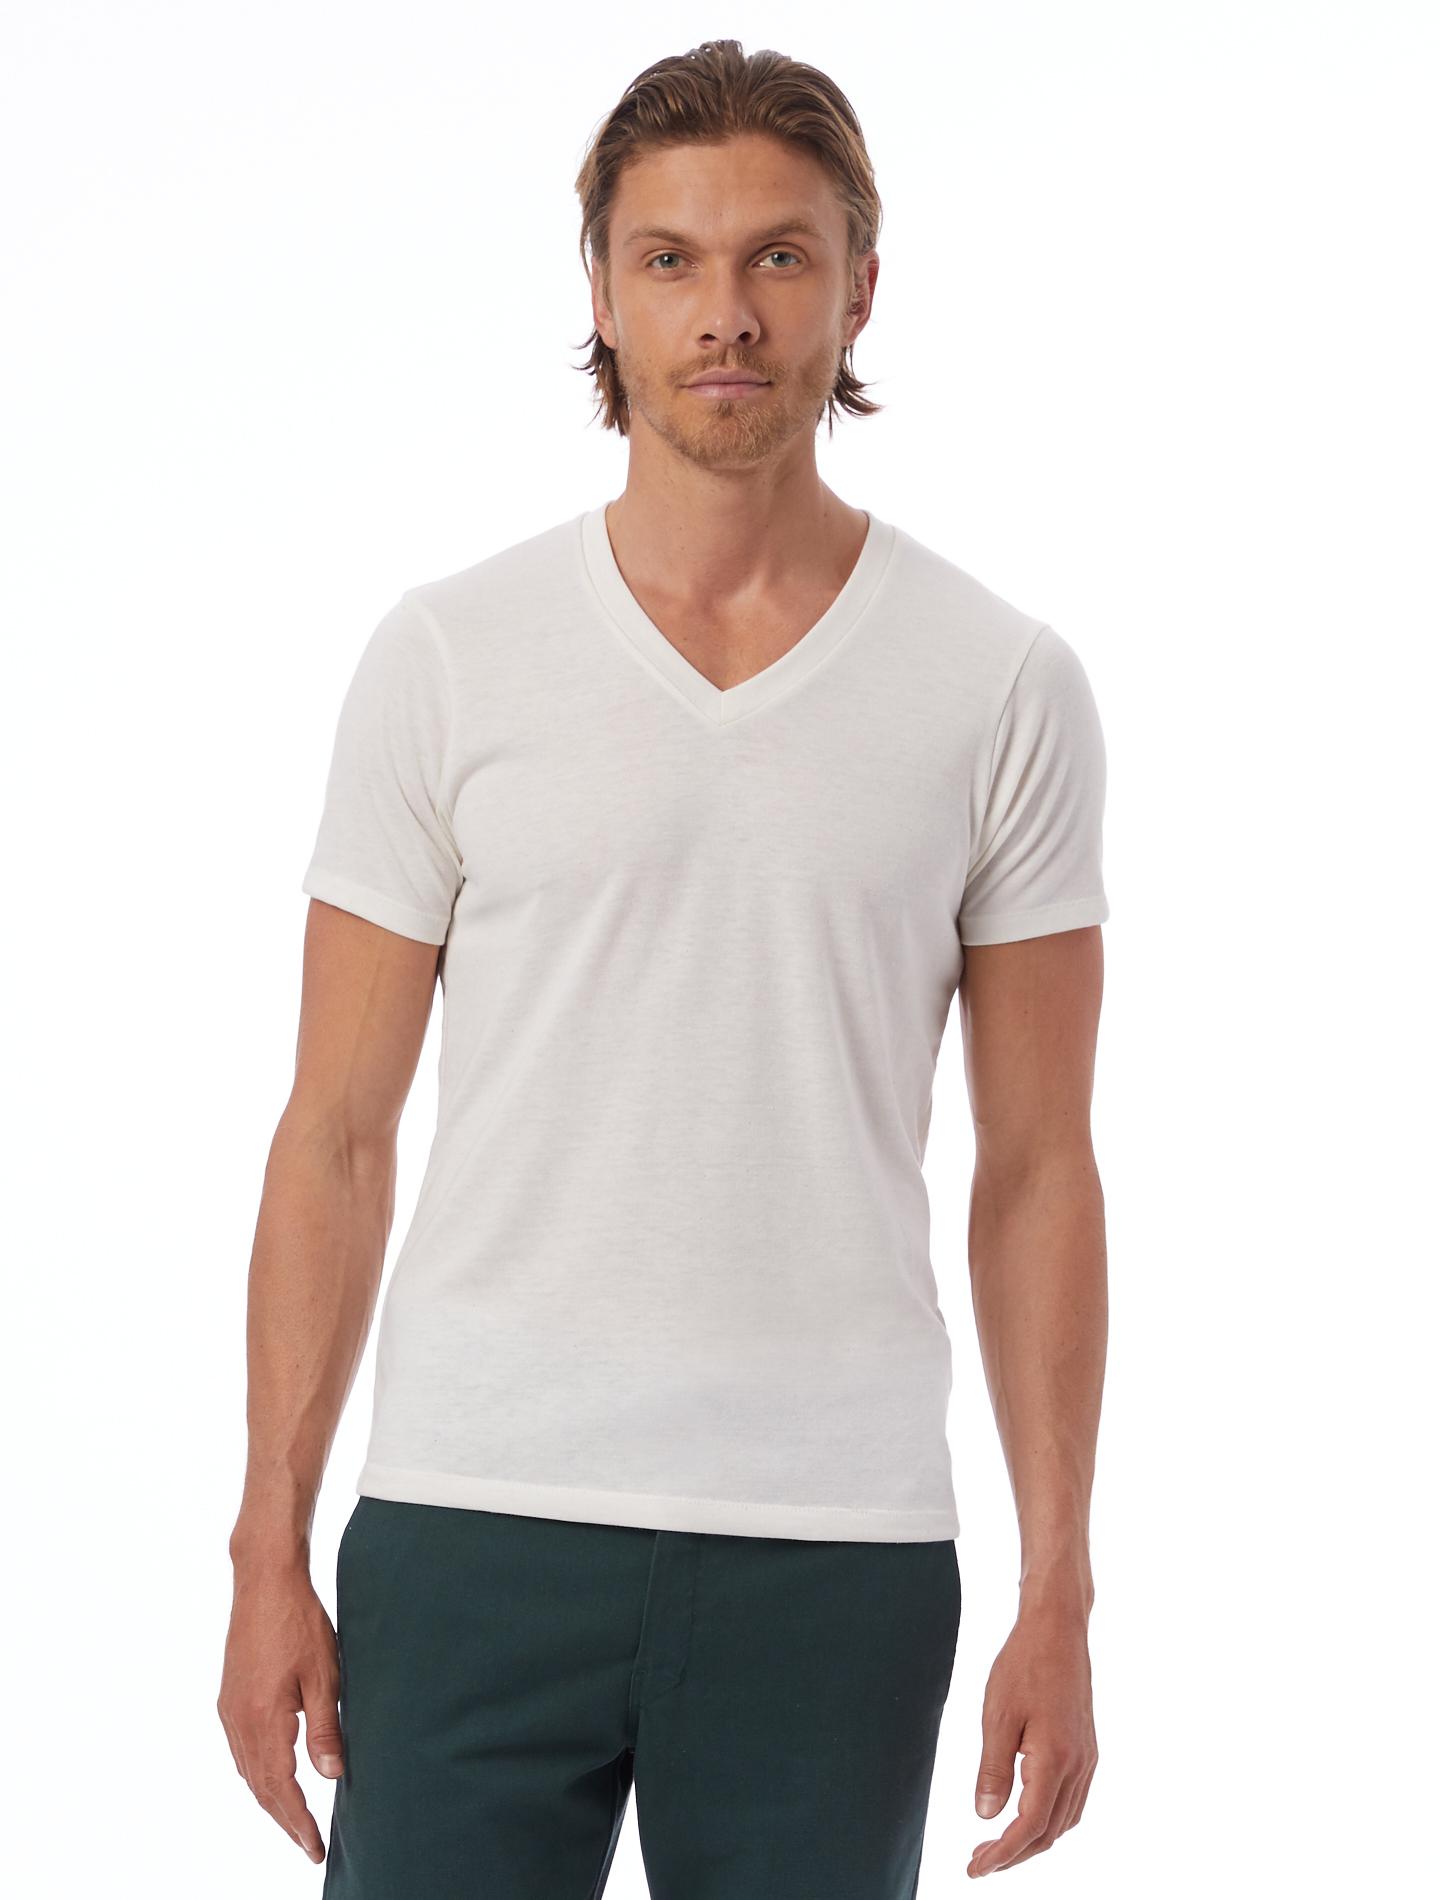 Boss V-Neck Eco-Jersey T-Shirt